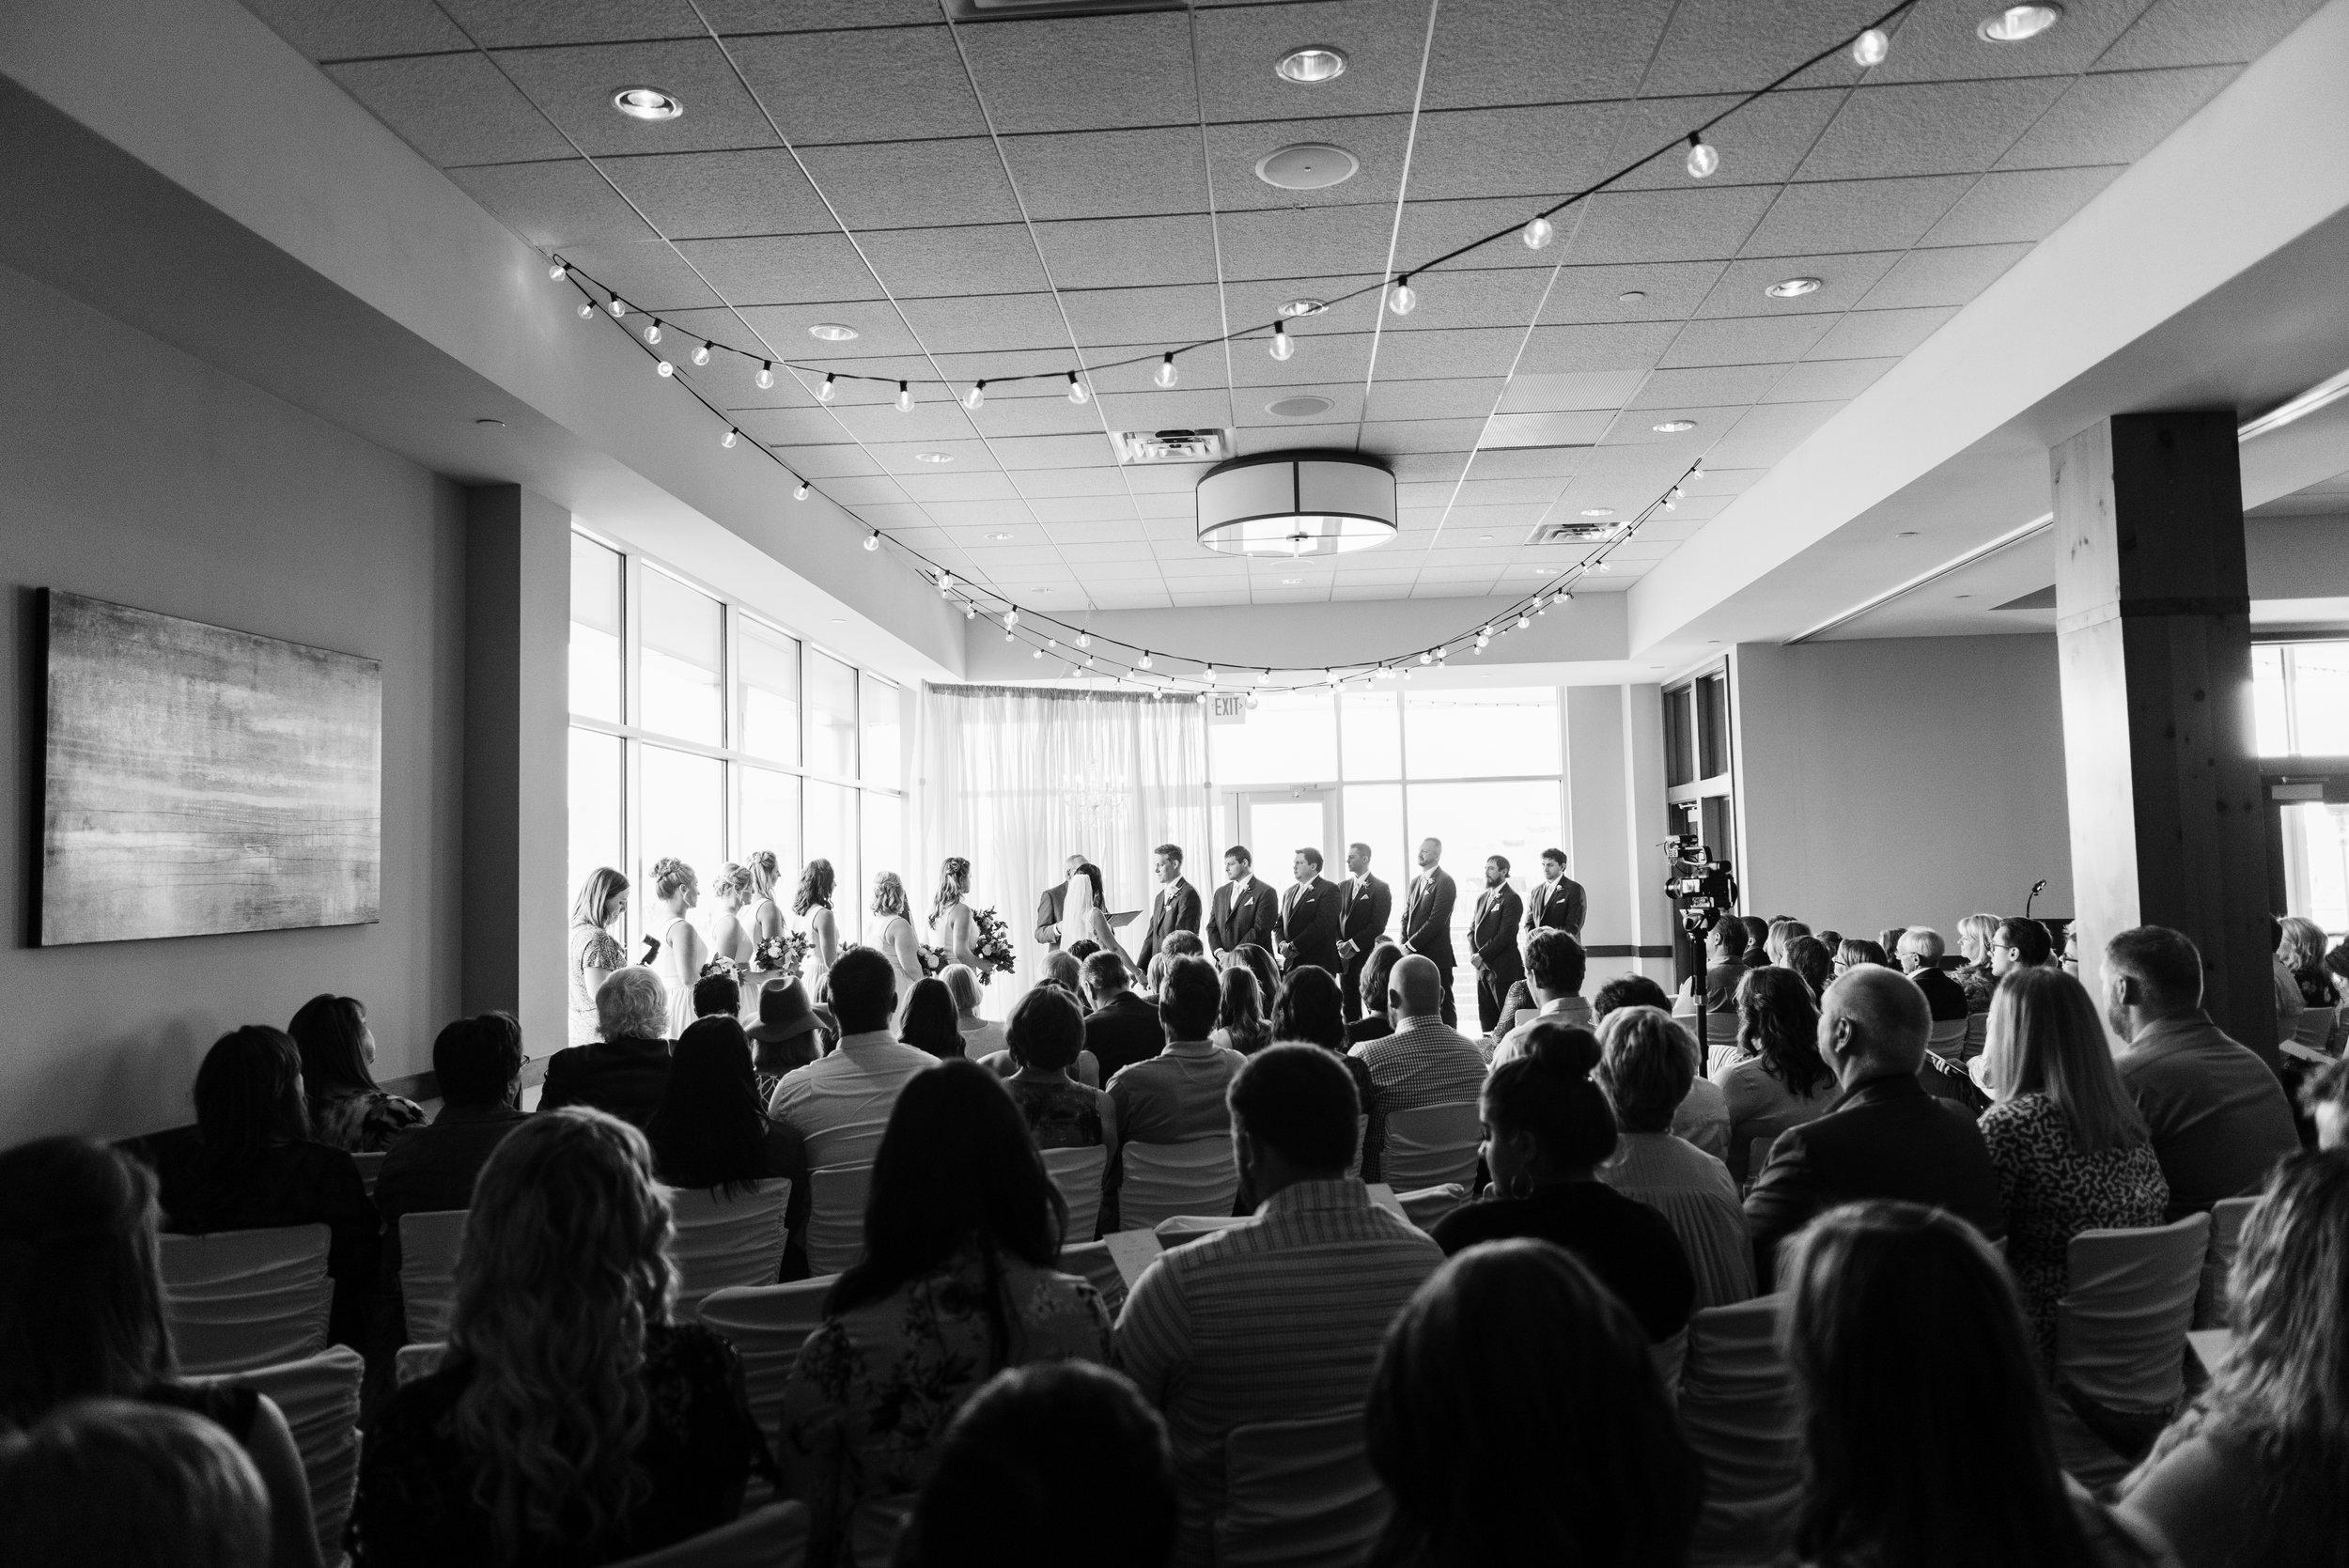 CeremonyHJ201701.jpg